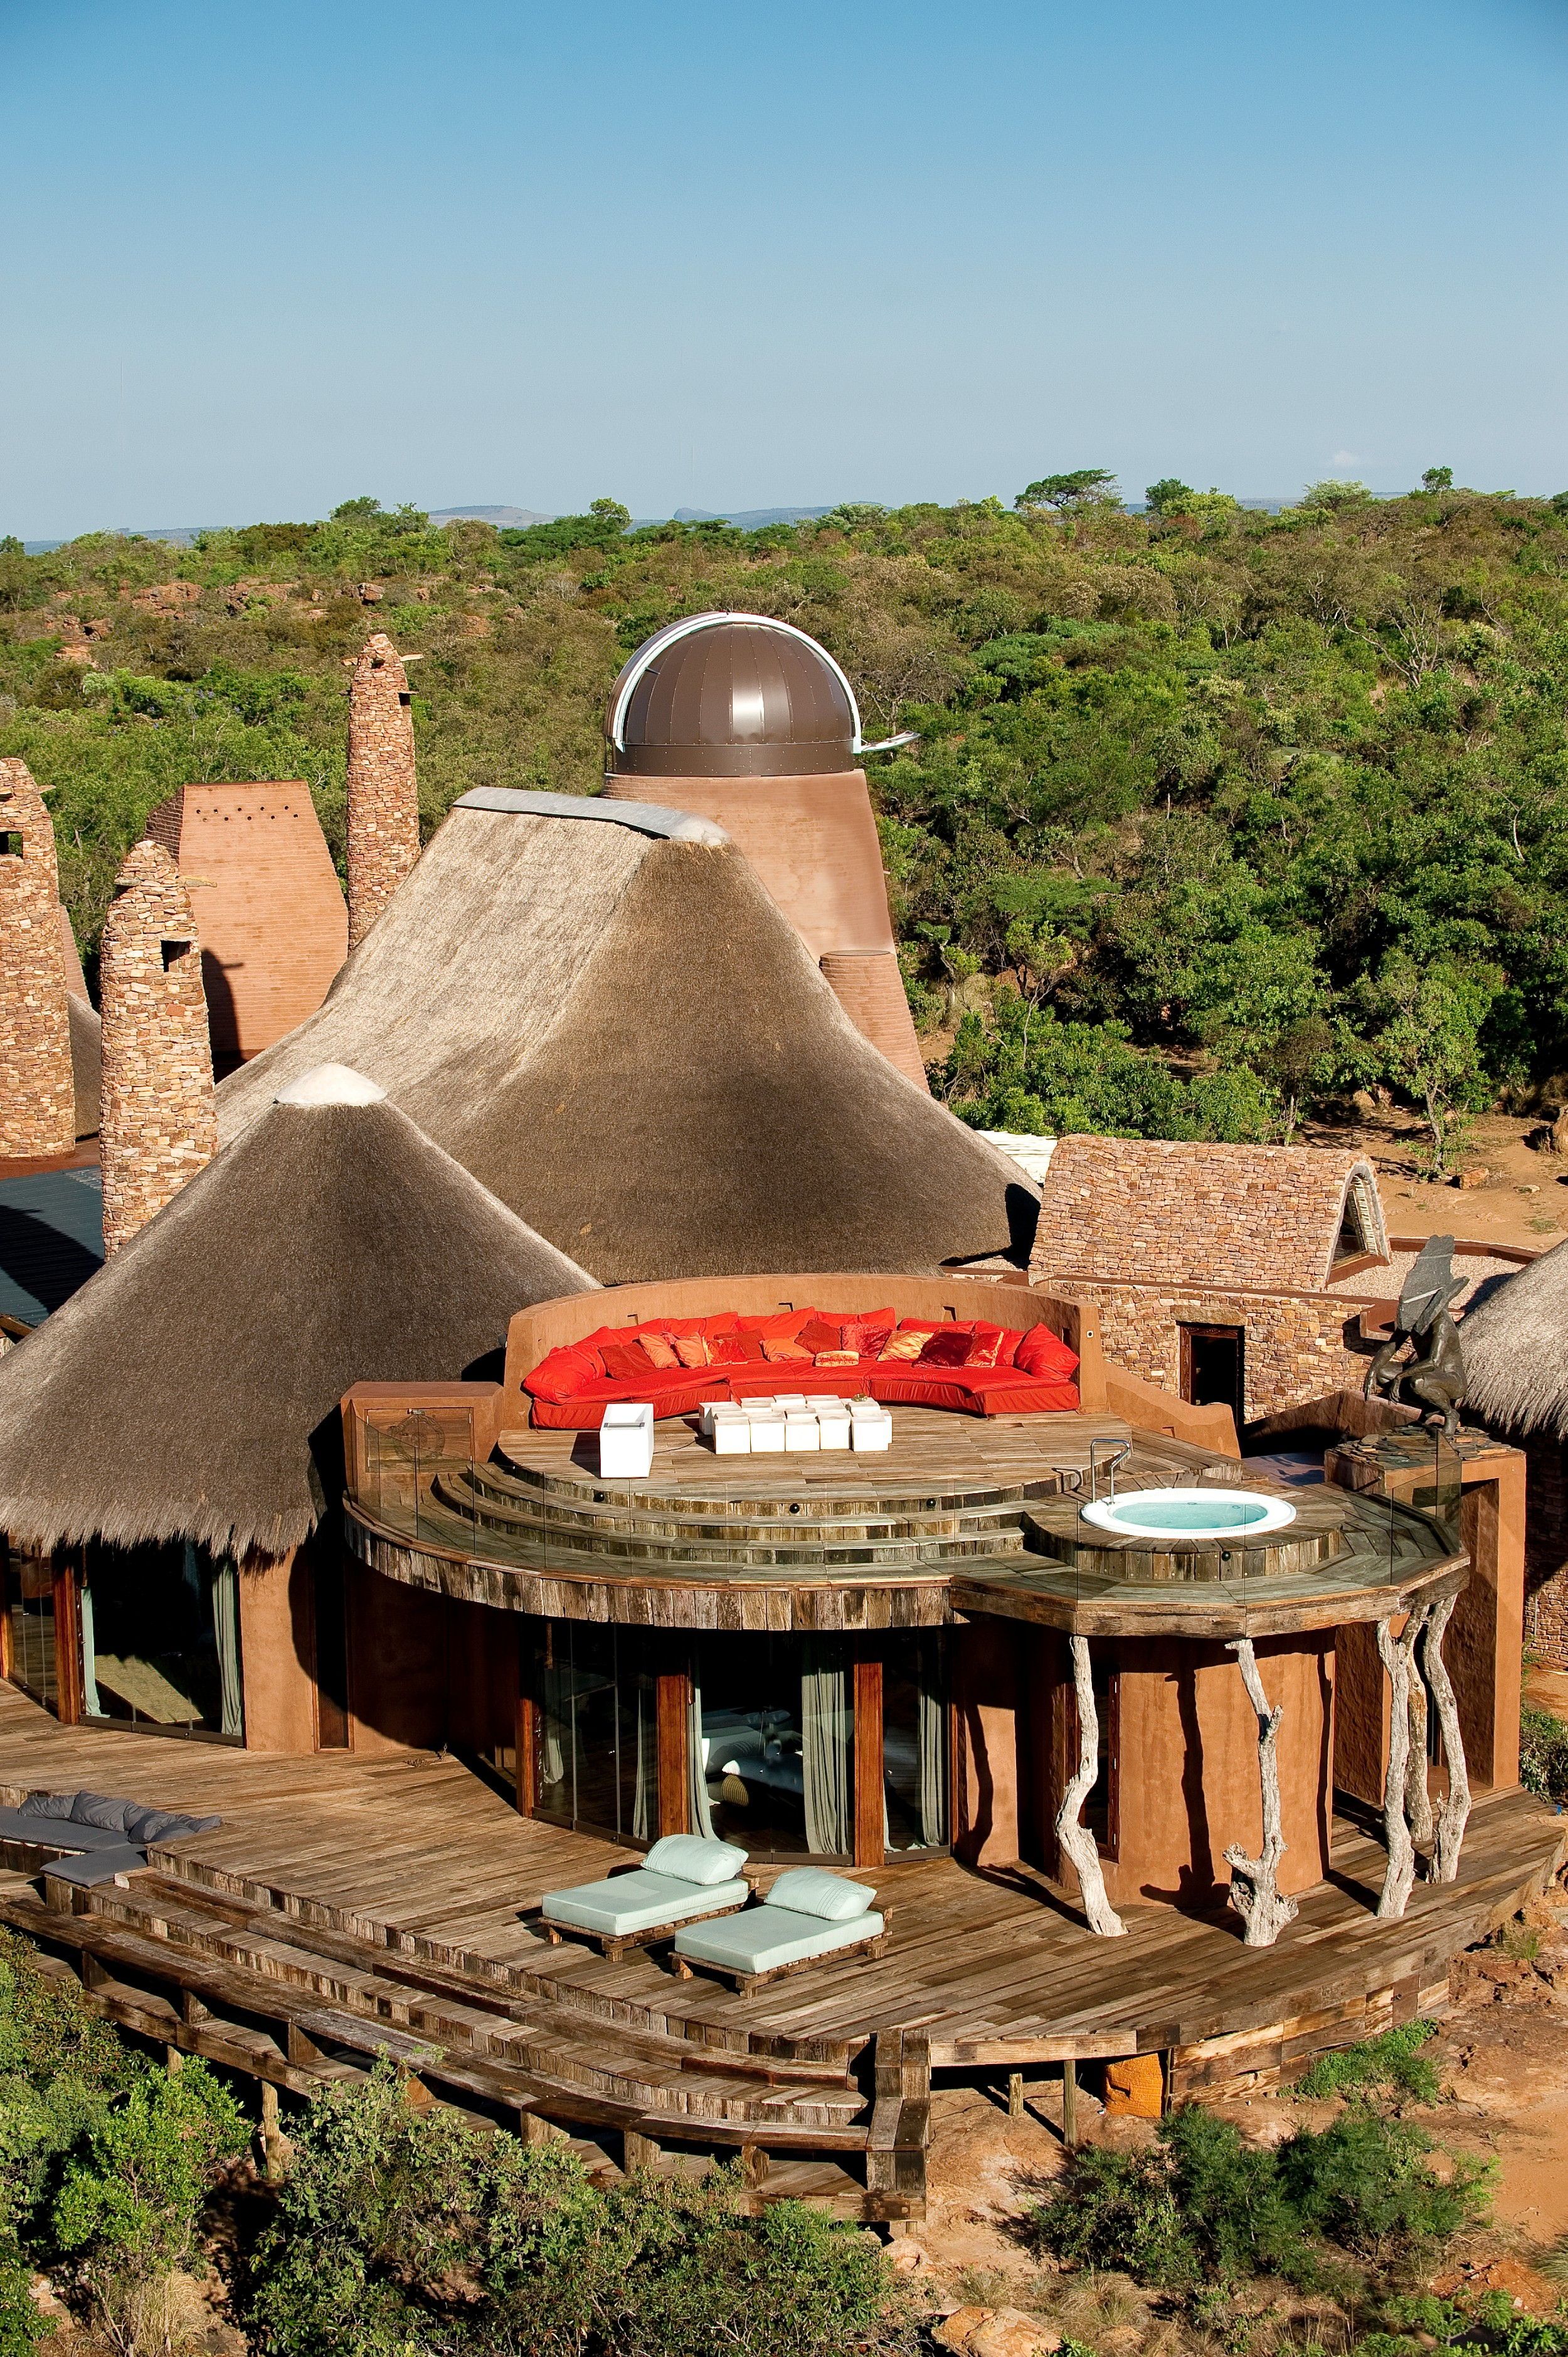 Roof terrace observatory dook 17.jpg